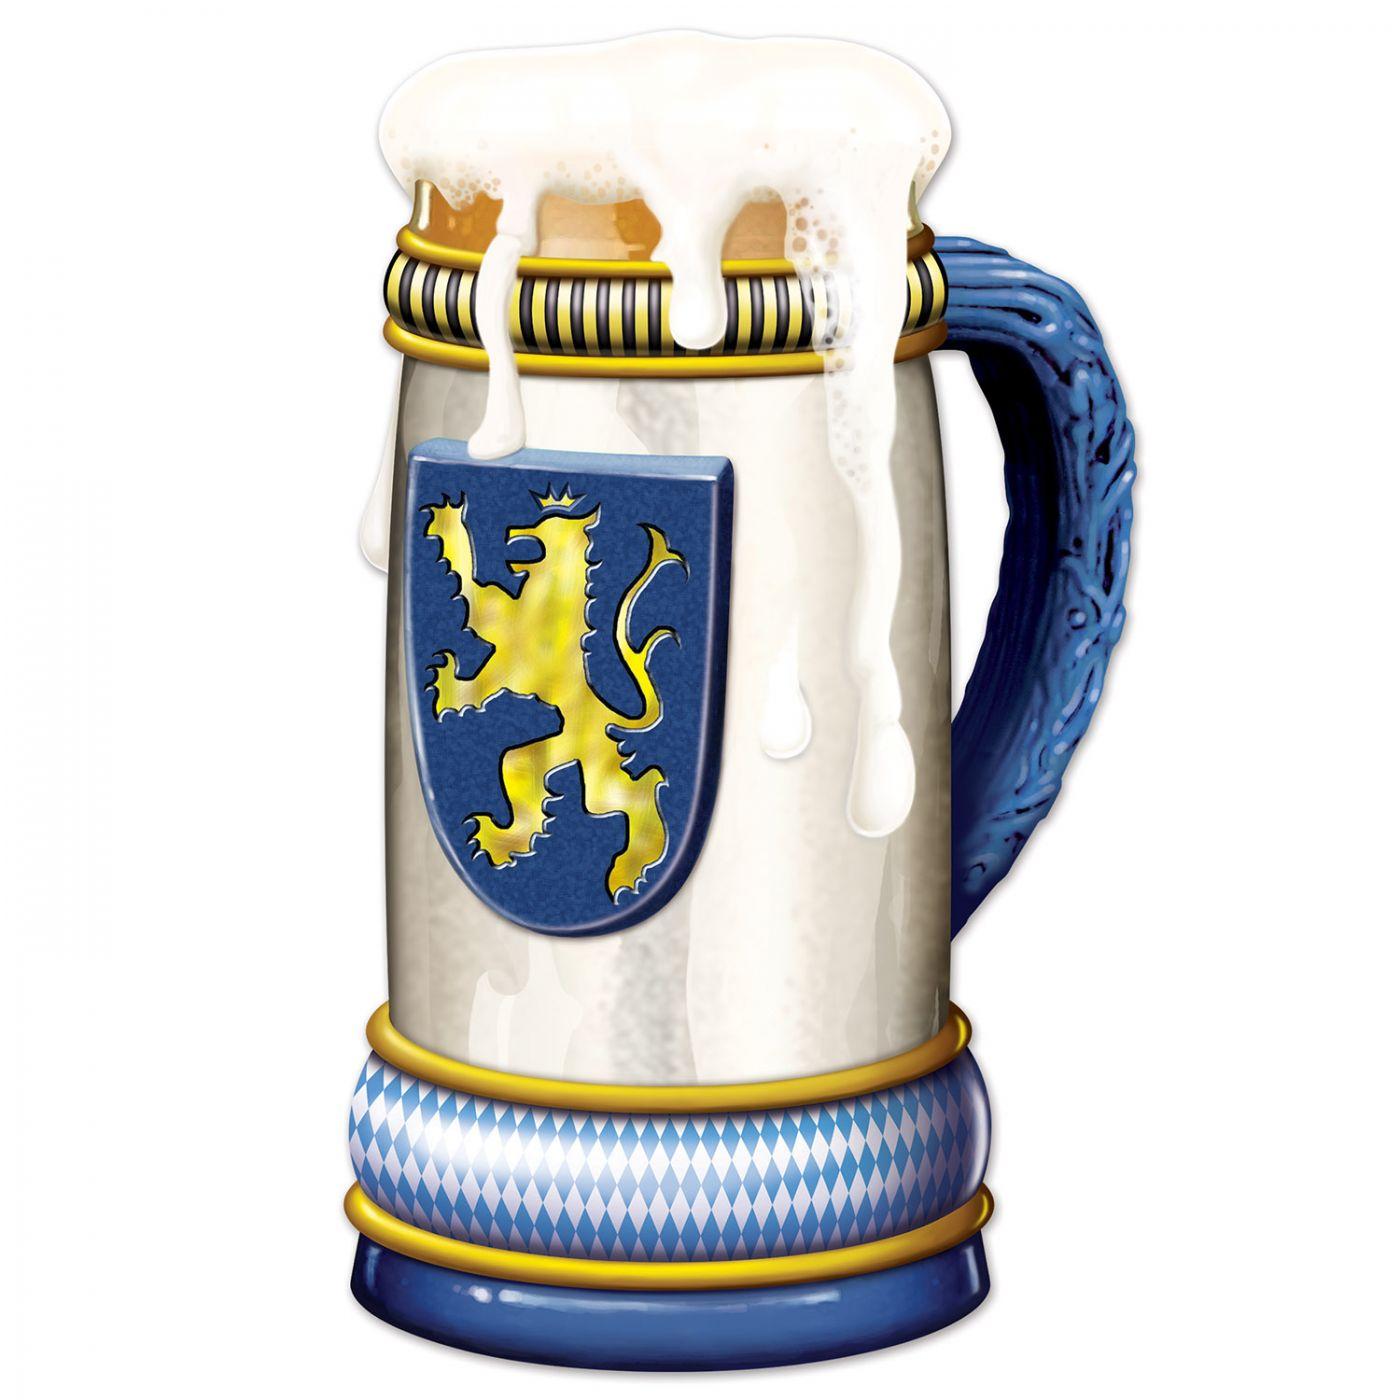 Jumbo Beer Stein Cutout image